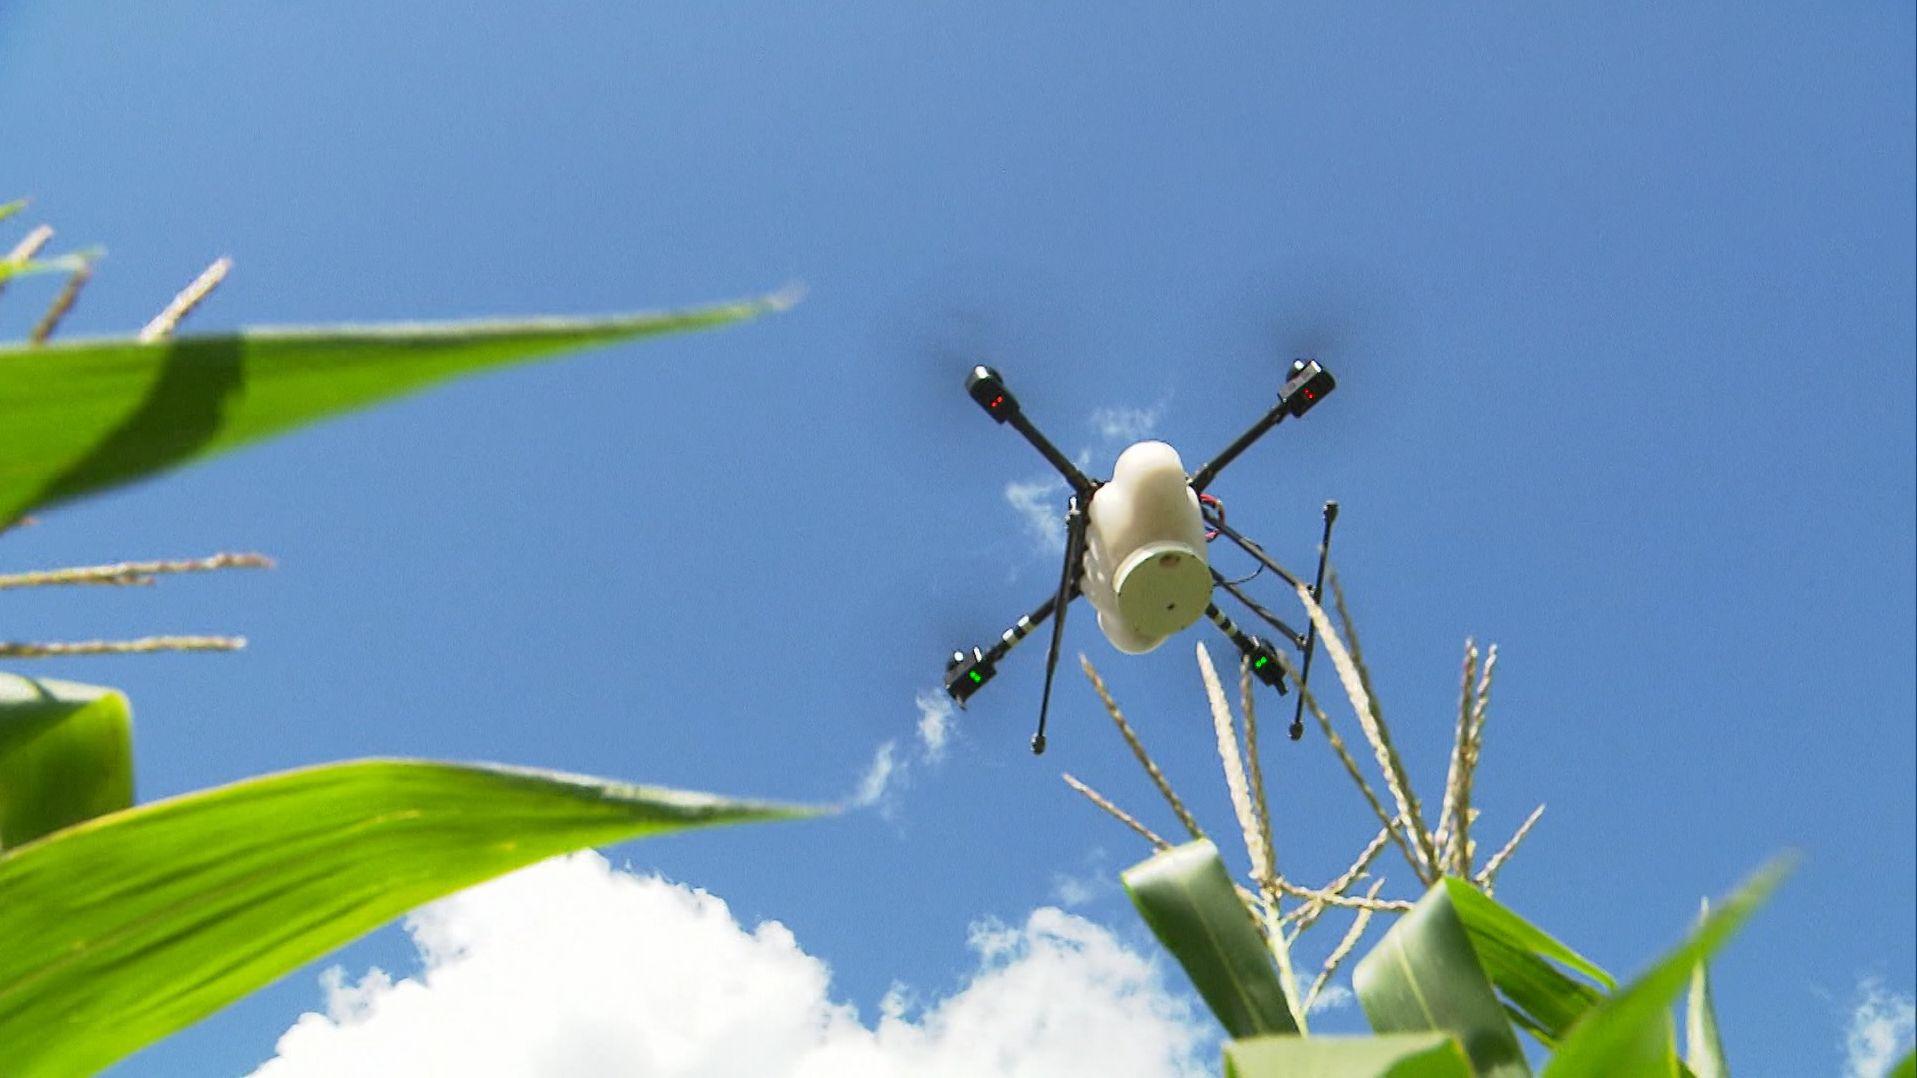 Schädlingsbekämpfung per Drohne